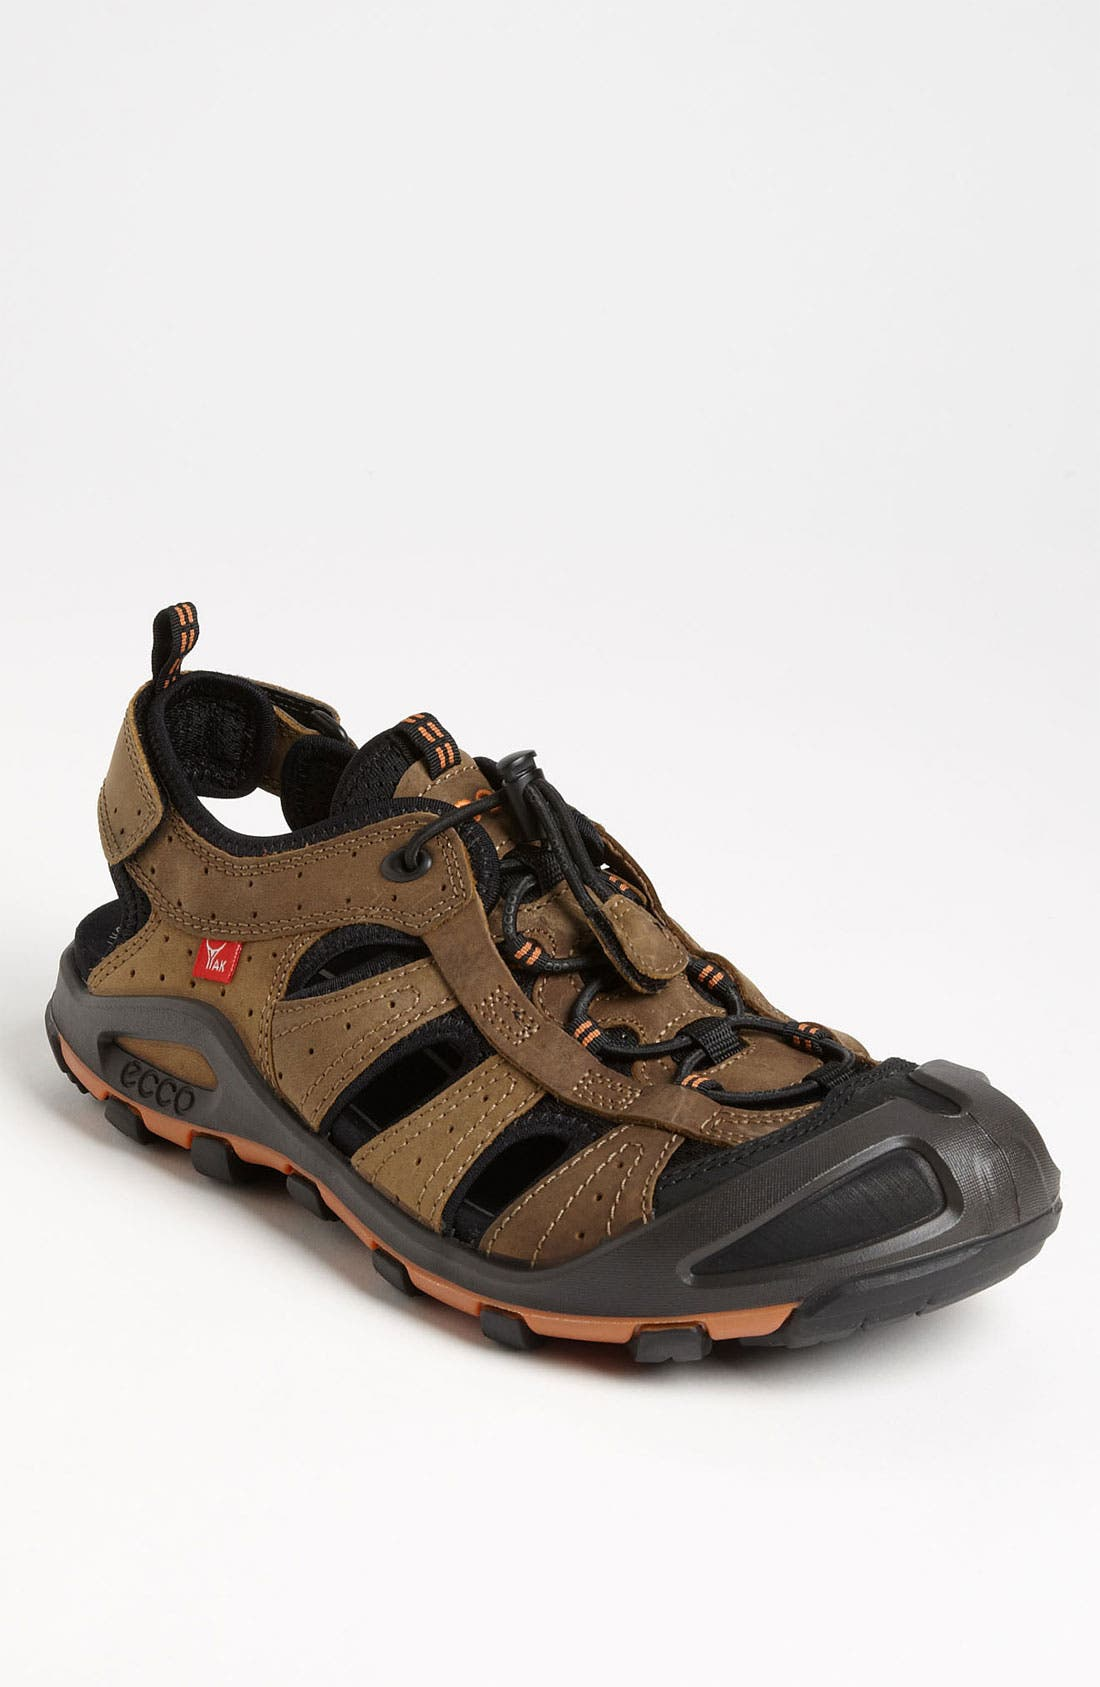 Alternate Image 1 Selected - ECCO 'Cerro' Sandal (Men)